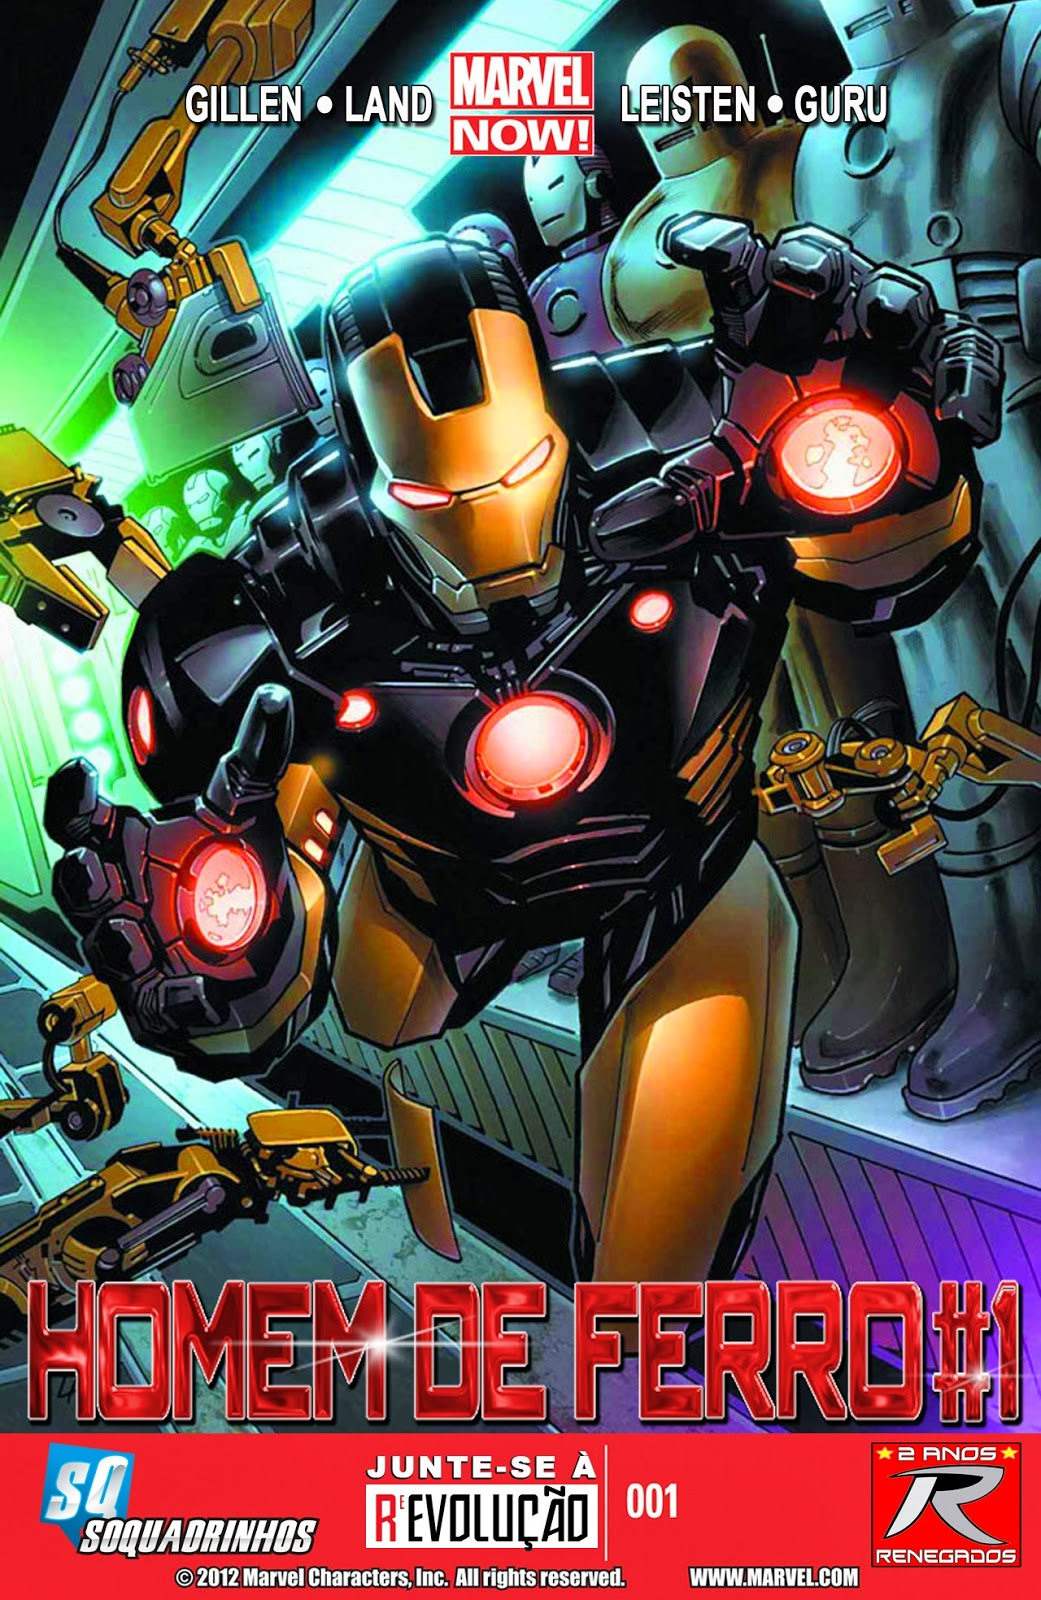 Nova Marvel! Homem de Ferro v6 #1